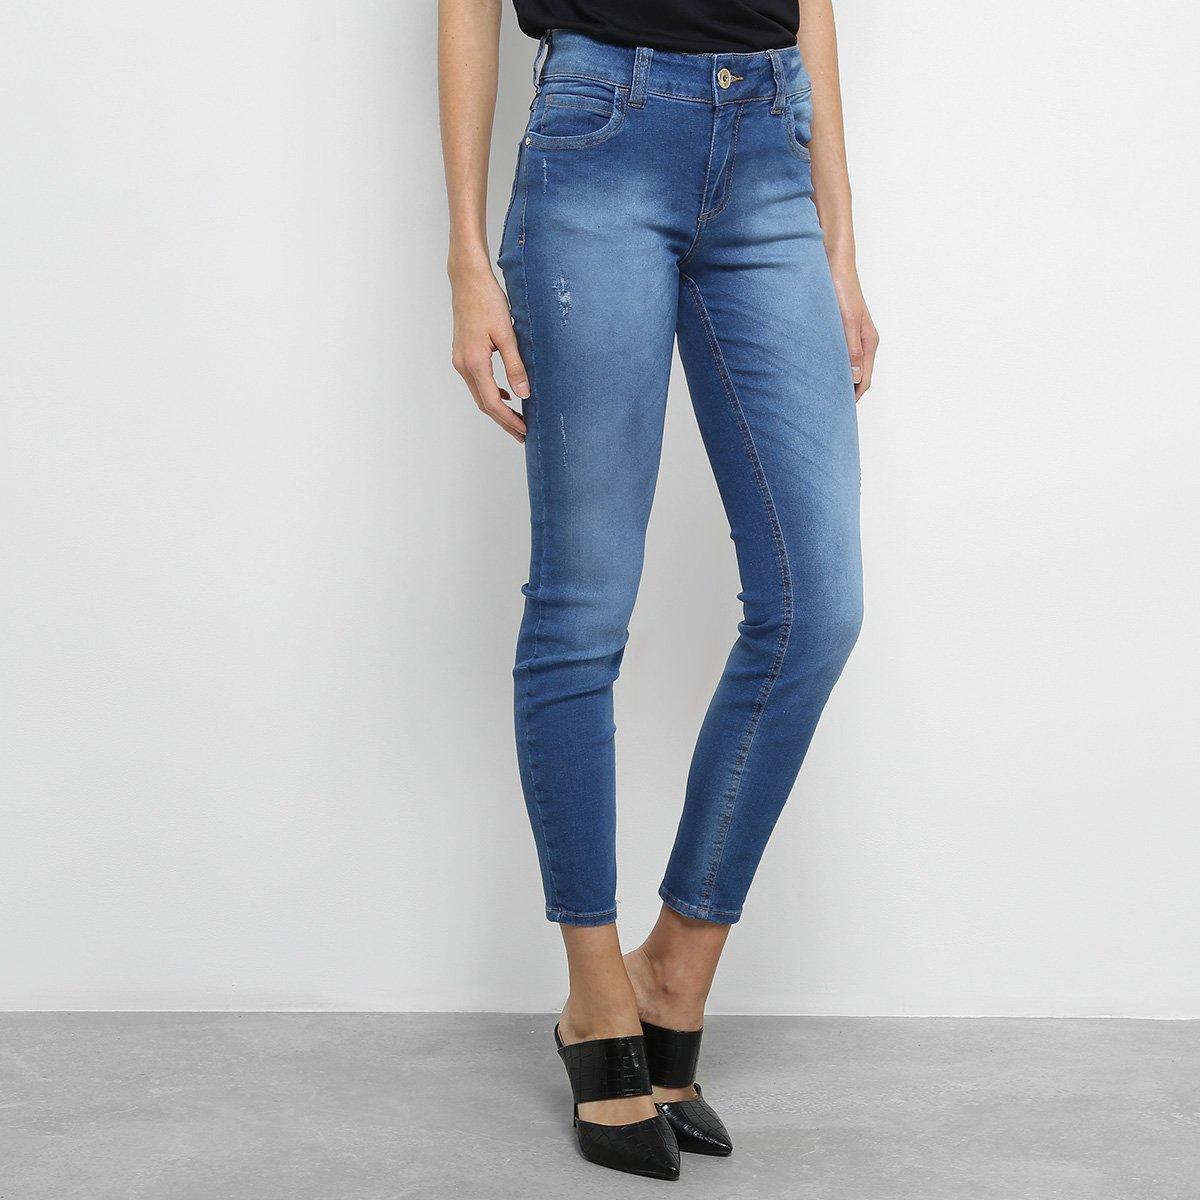 59dd0b770 Calça Jeans Skinny Colcci Estonada Cintura Média Feminina